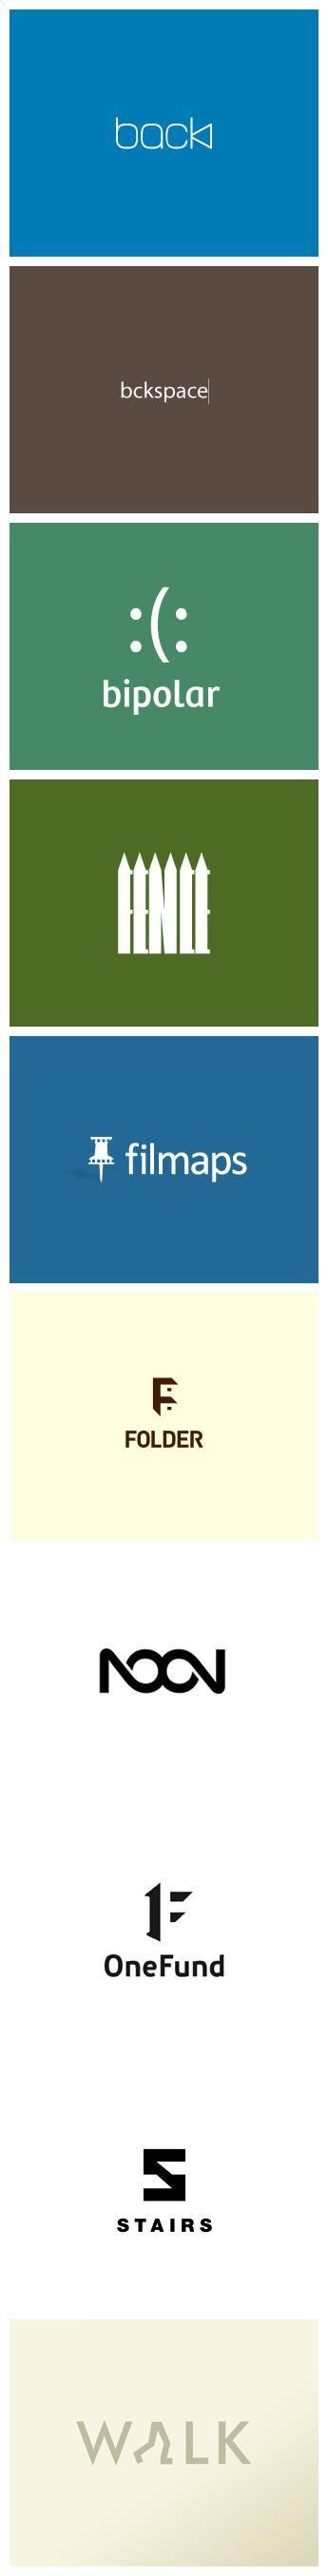 Highly Clever Minimal Logo Designs #logo #design